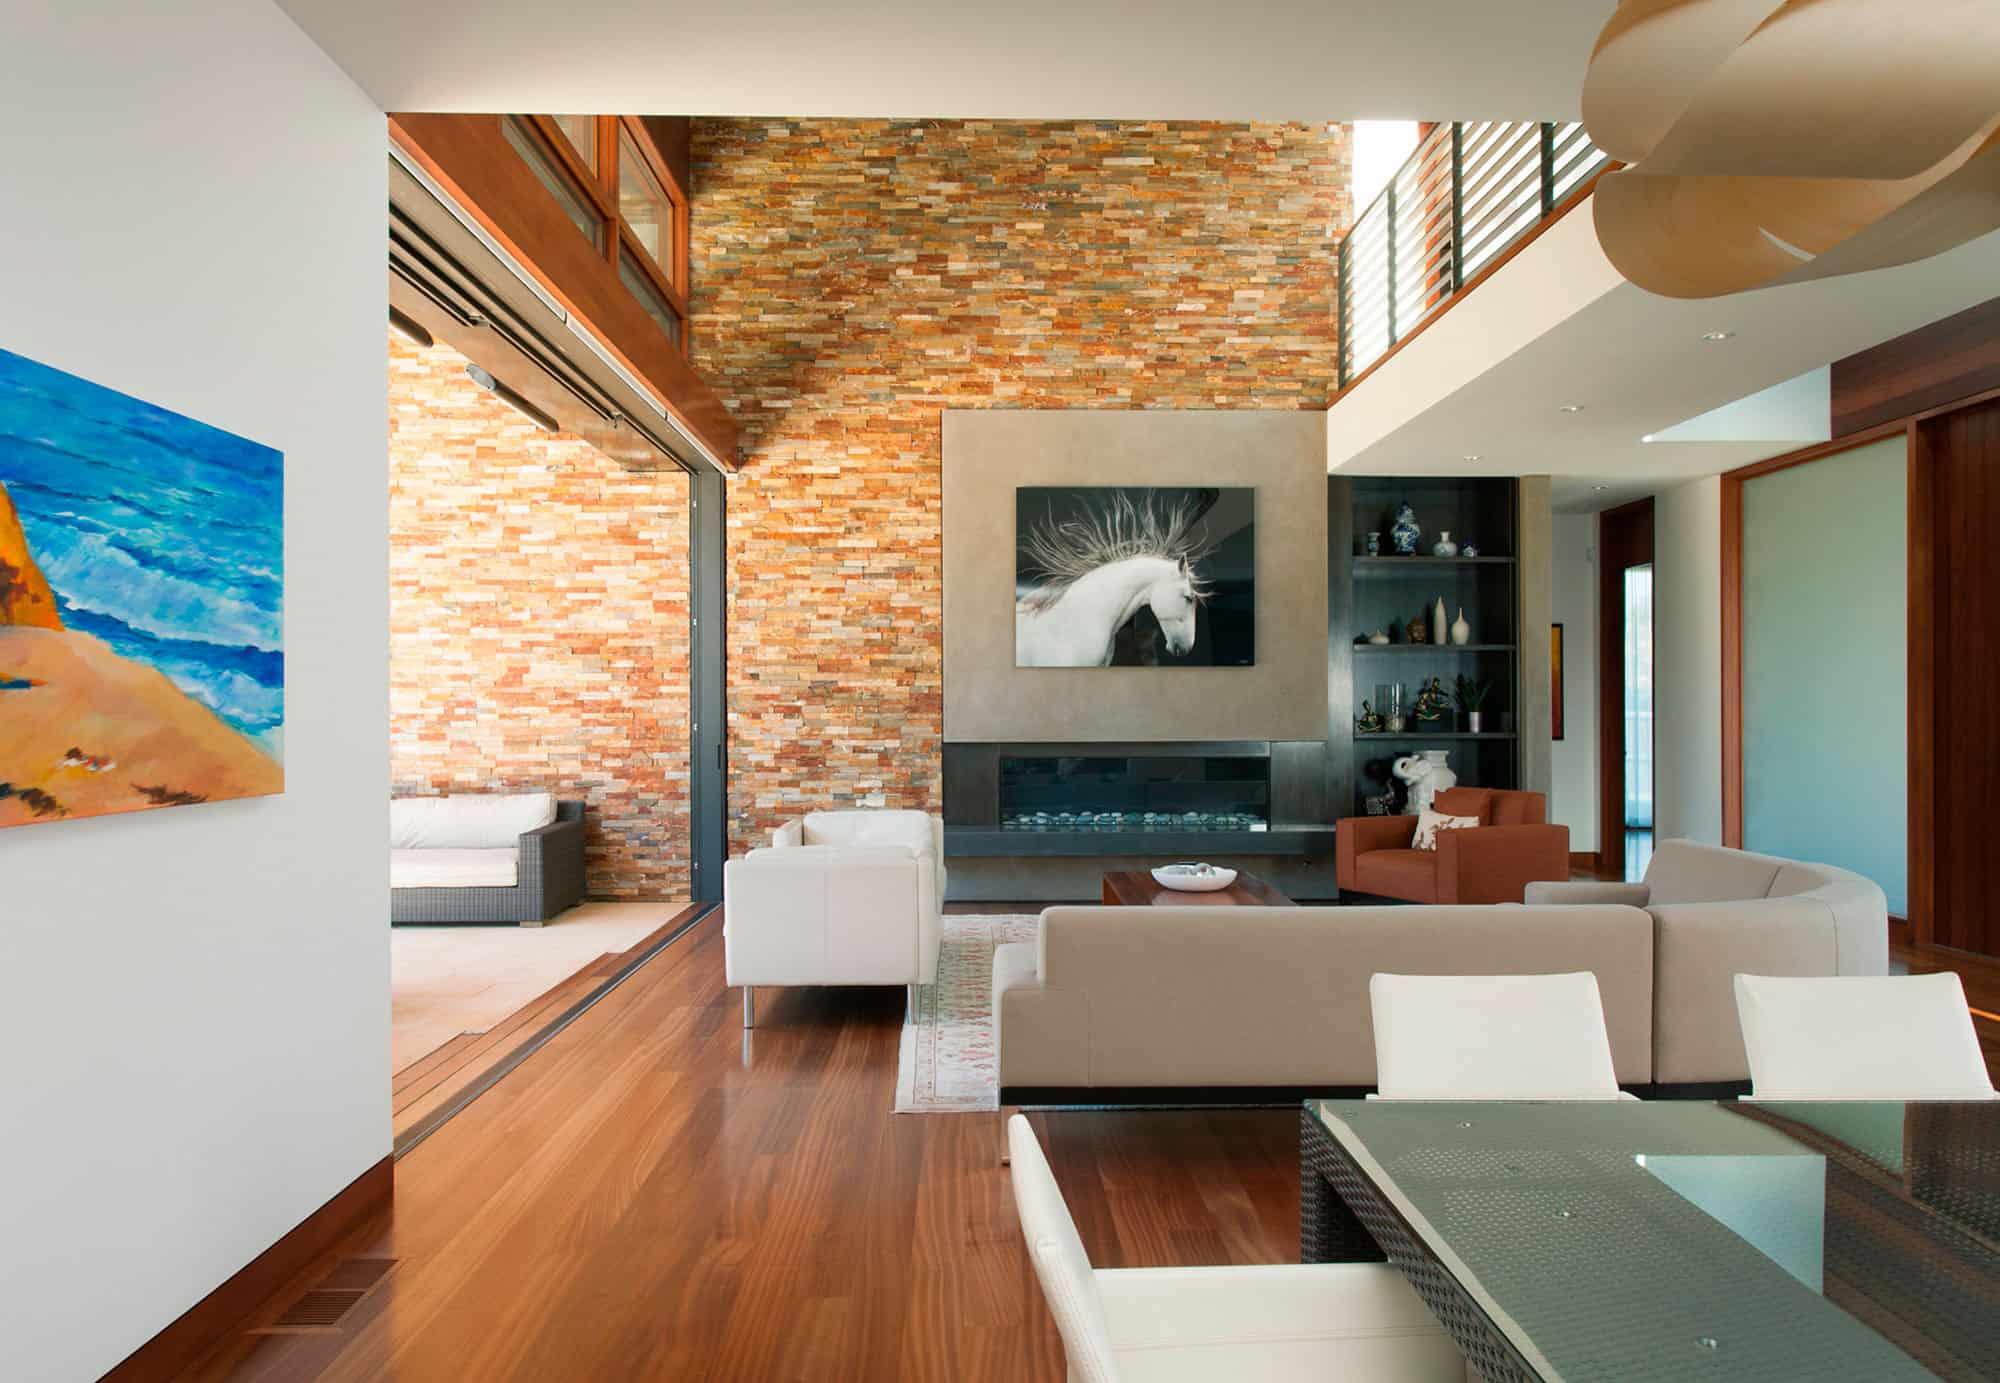 Rashid Residence by Swatt Miers Architects